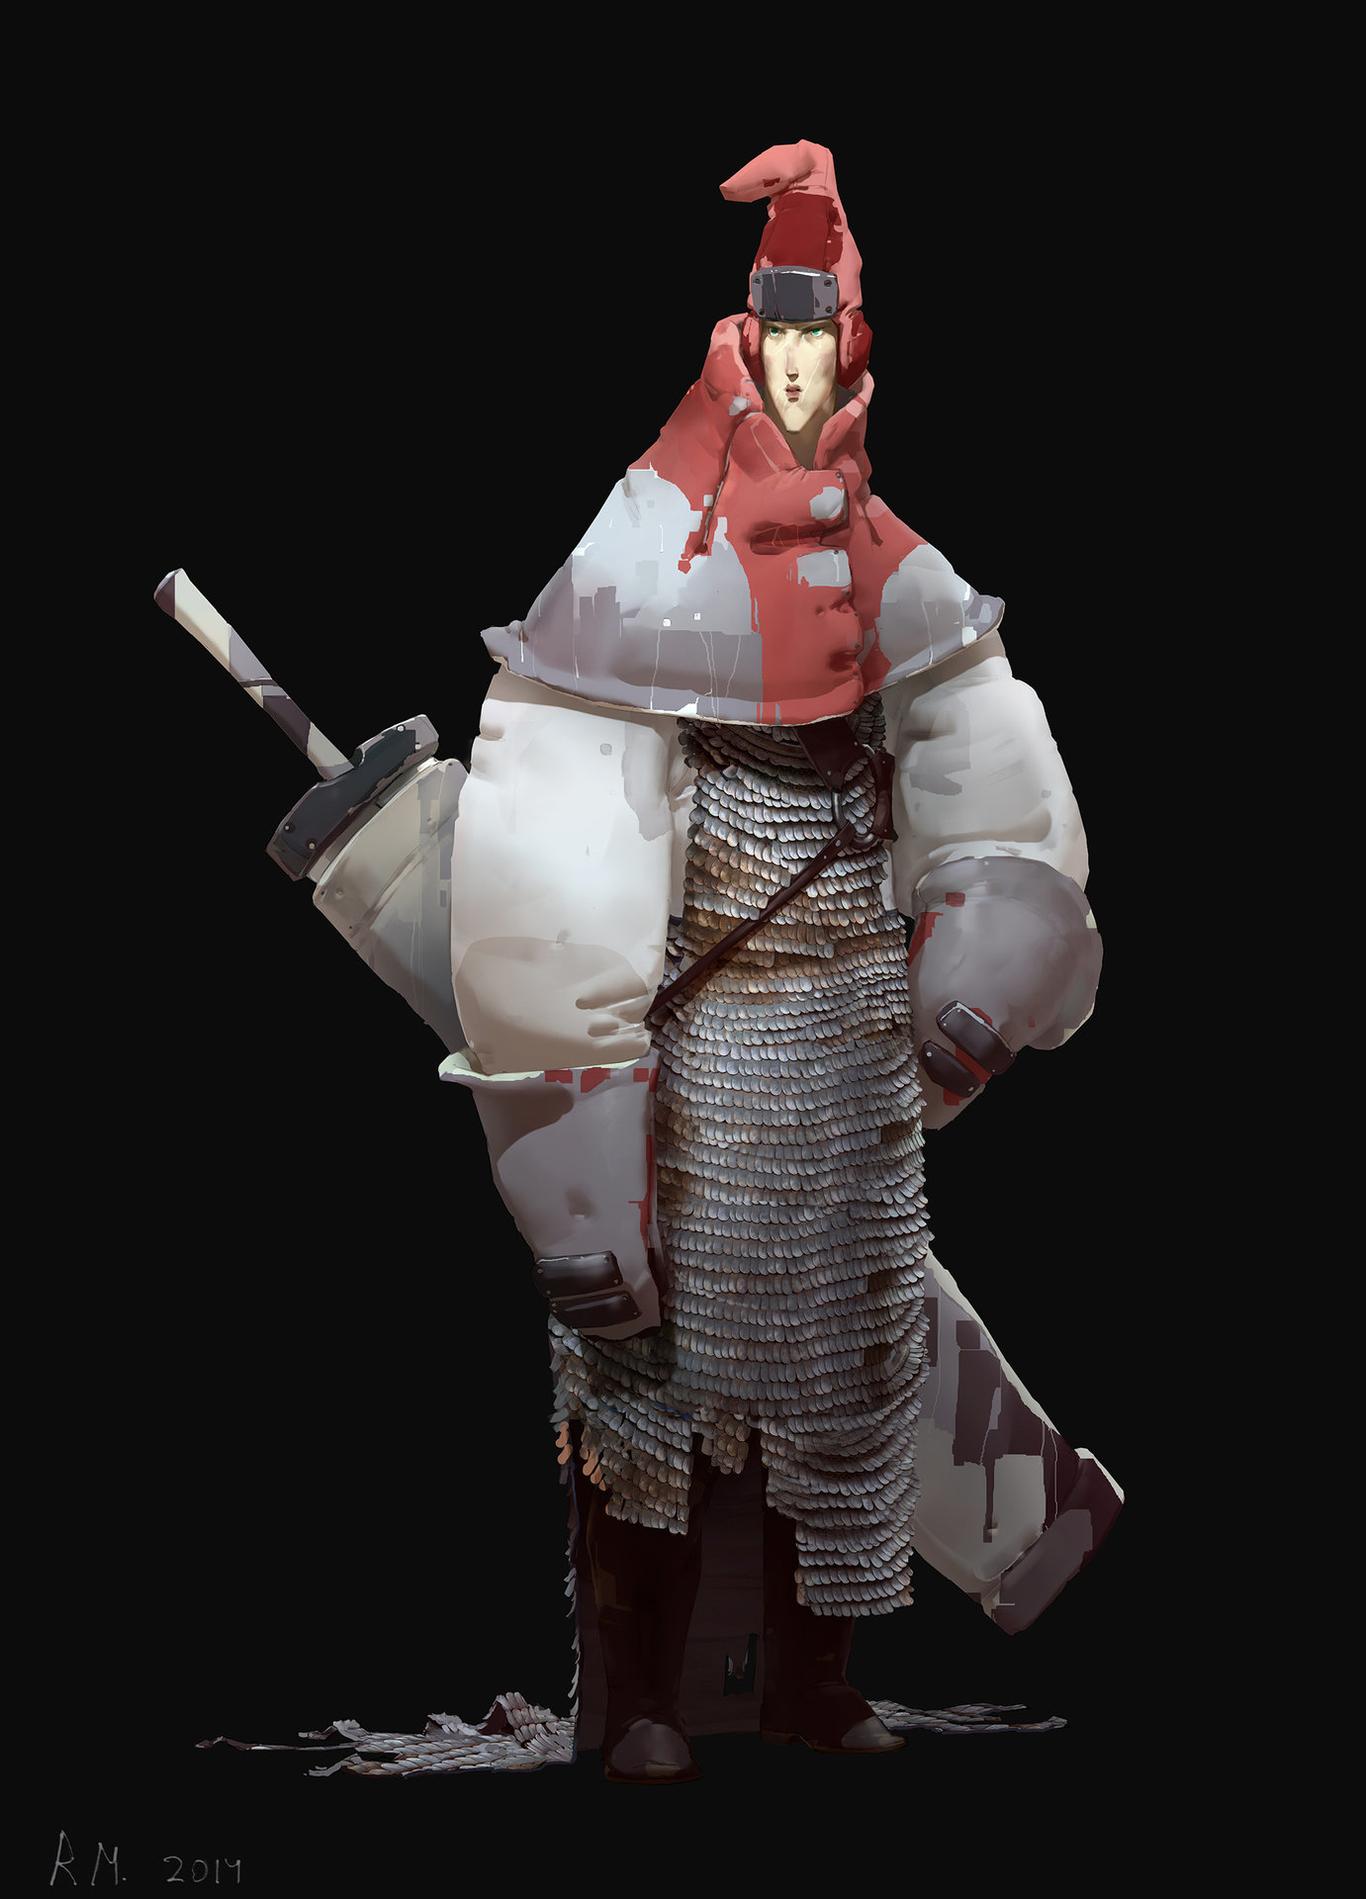 Rahmatozz knight number 1 1 59a33235 78mj